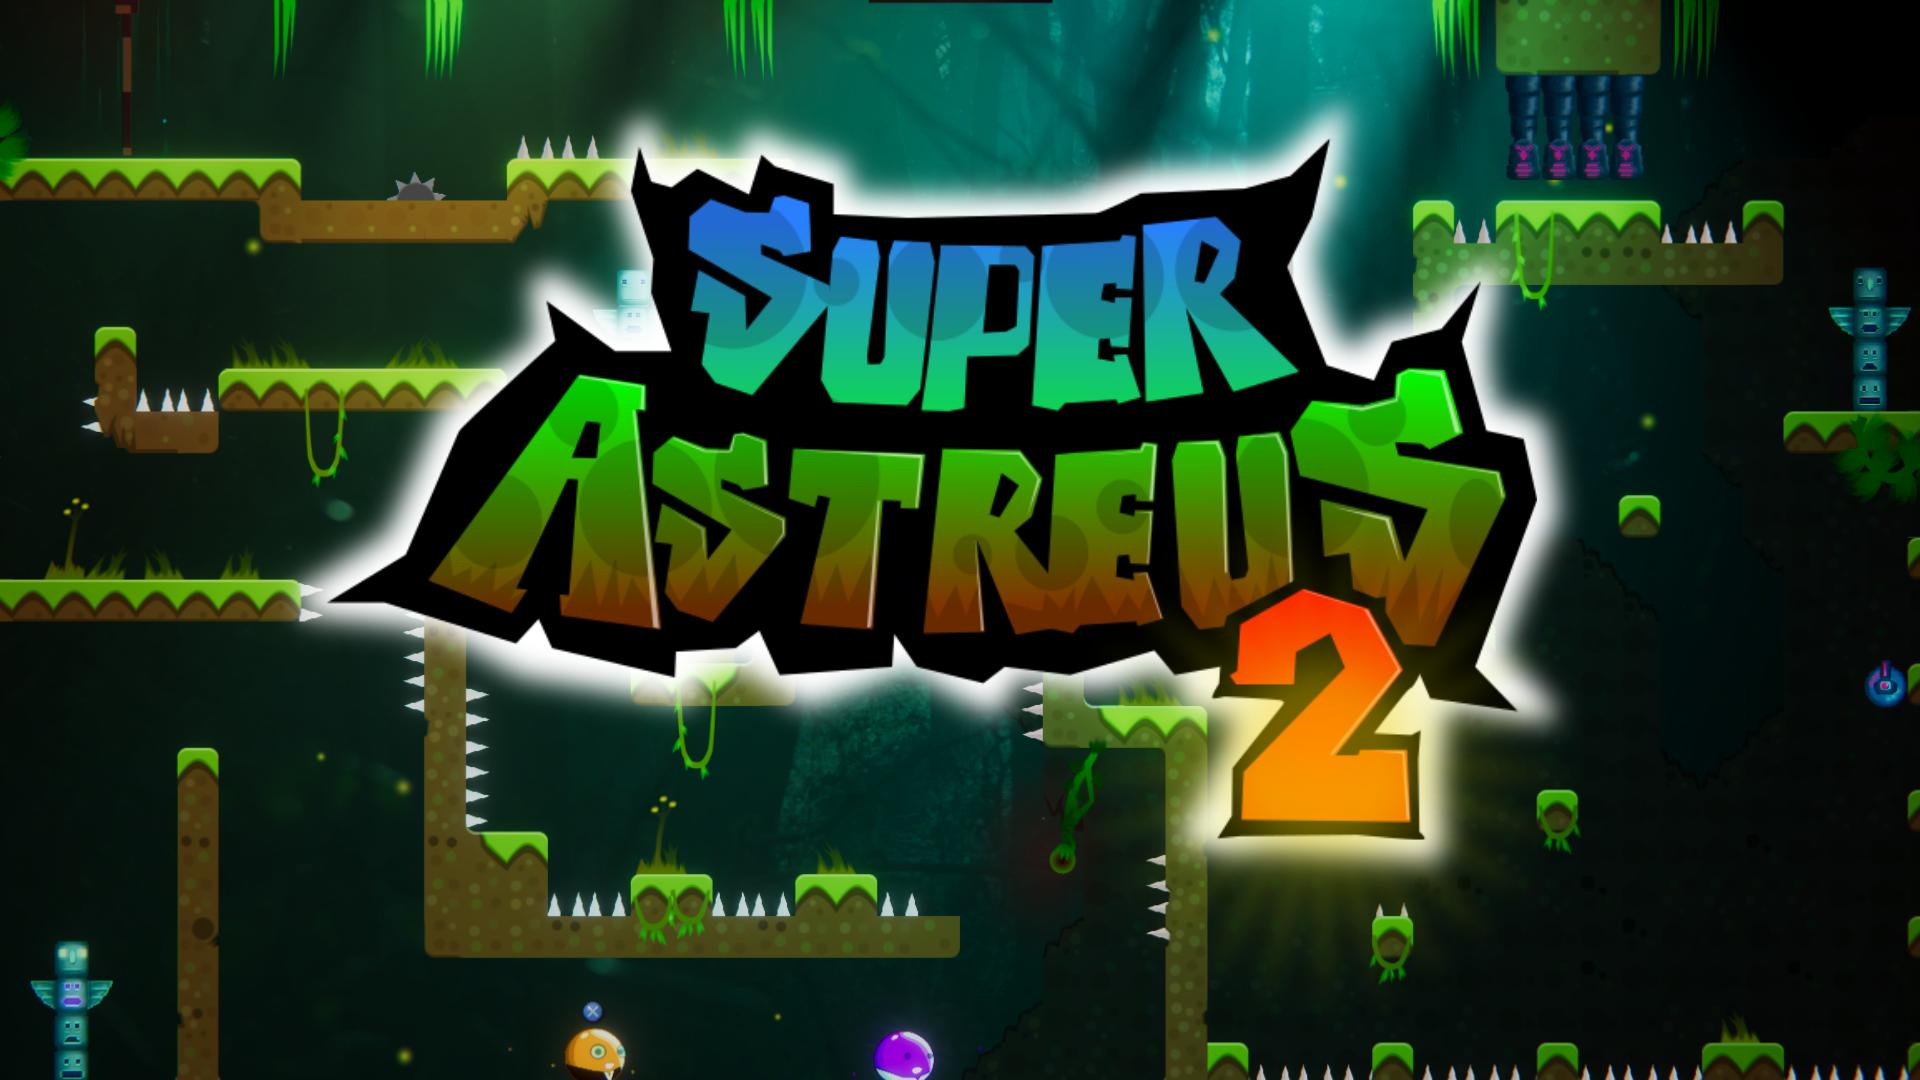 Super Astreus 2